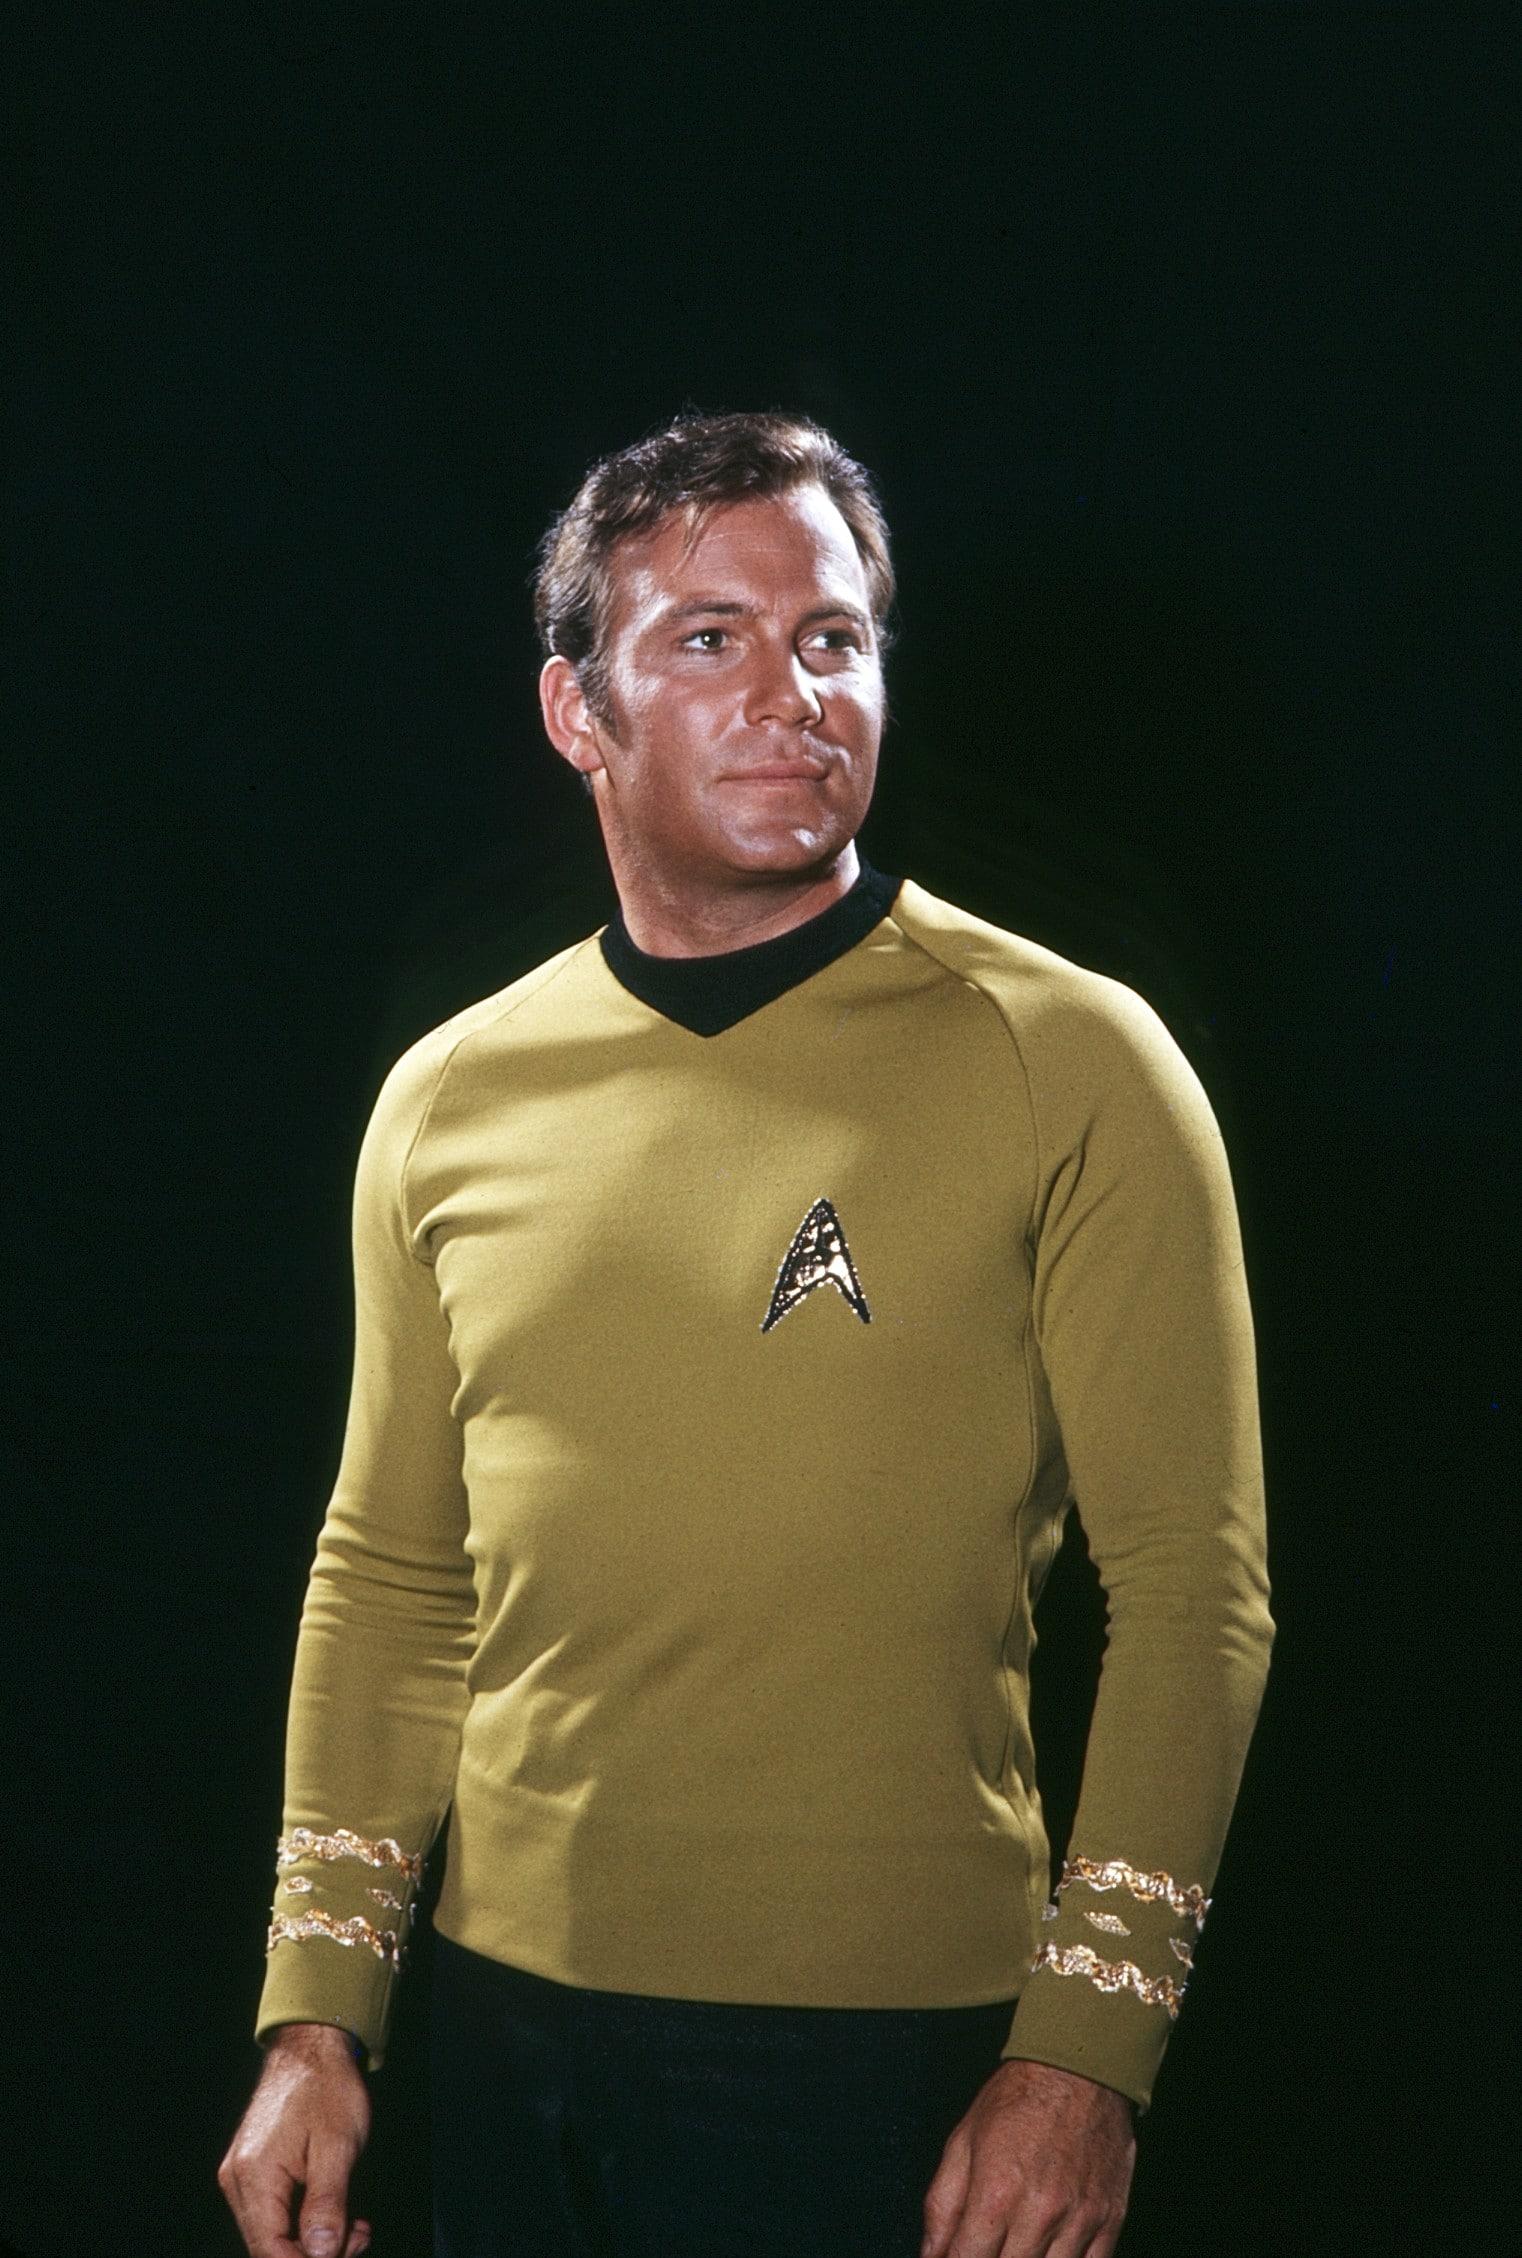 STAR TREK, William Shatner, (photo: 1968), 1966-69